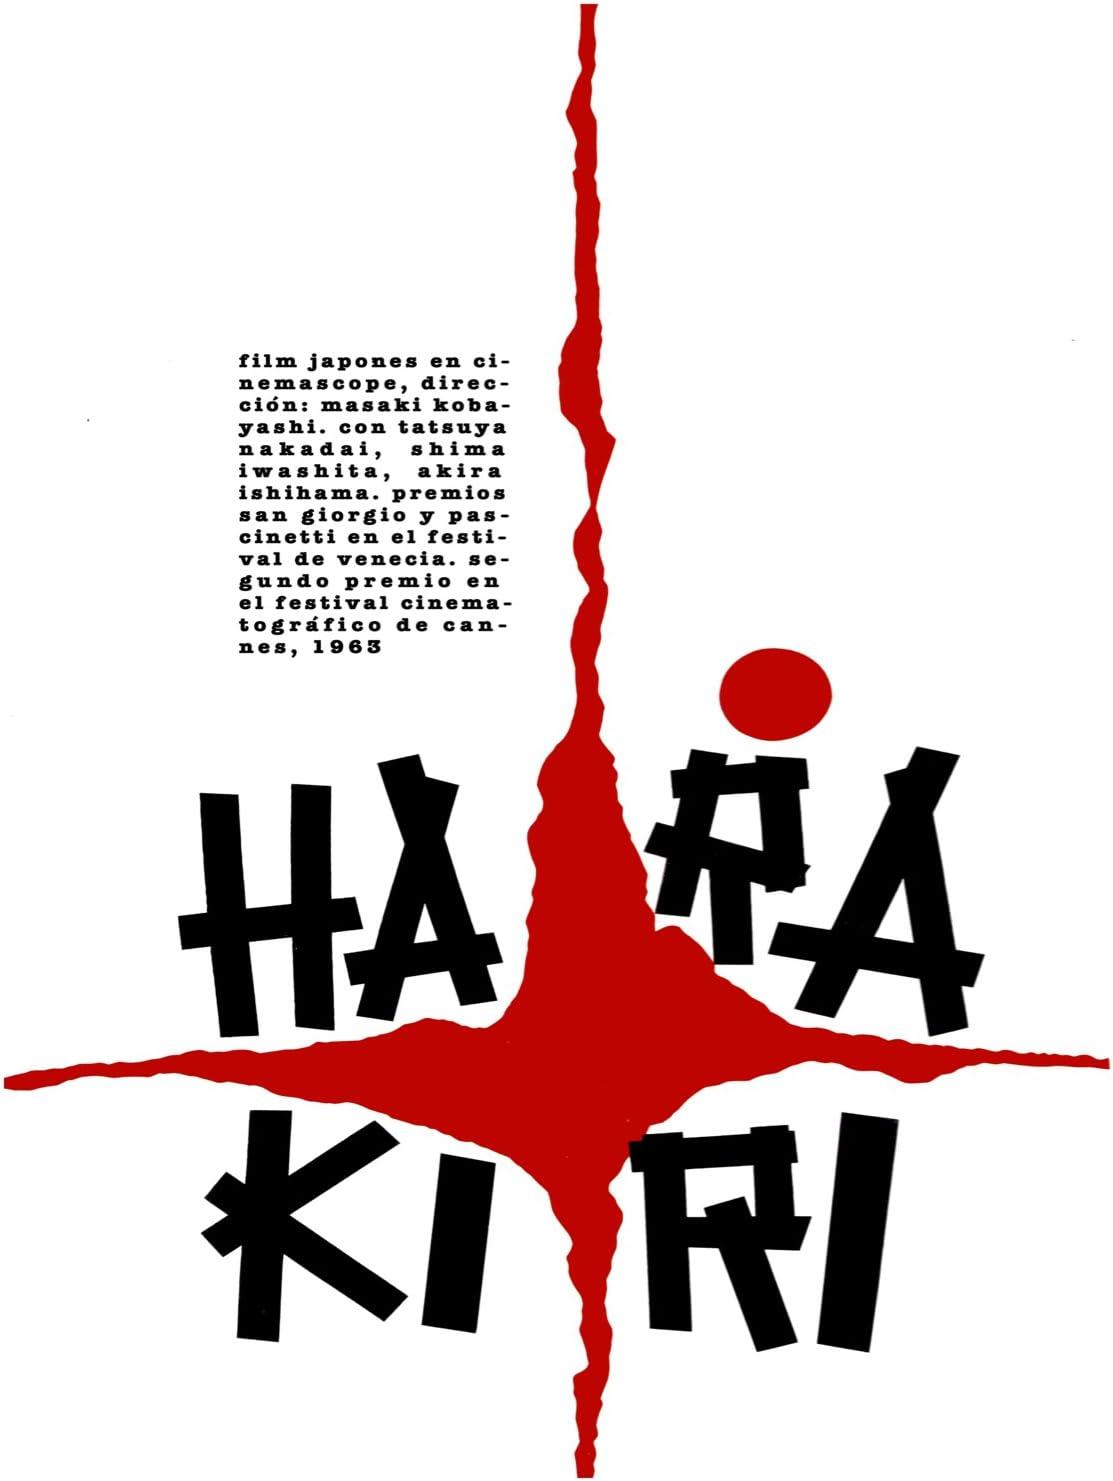 Decoration Poster Reproduction.Wall Design Art.Harakiri Movie.Japanese Suicide Ritual.Samurai